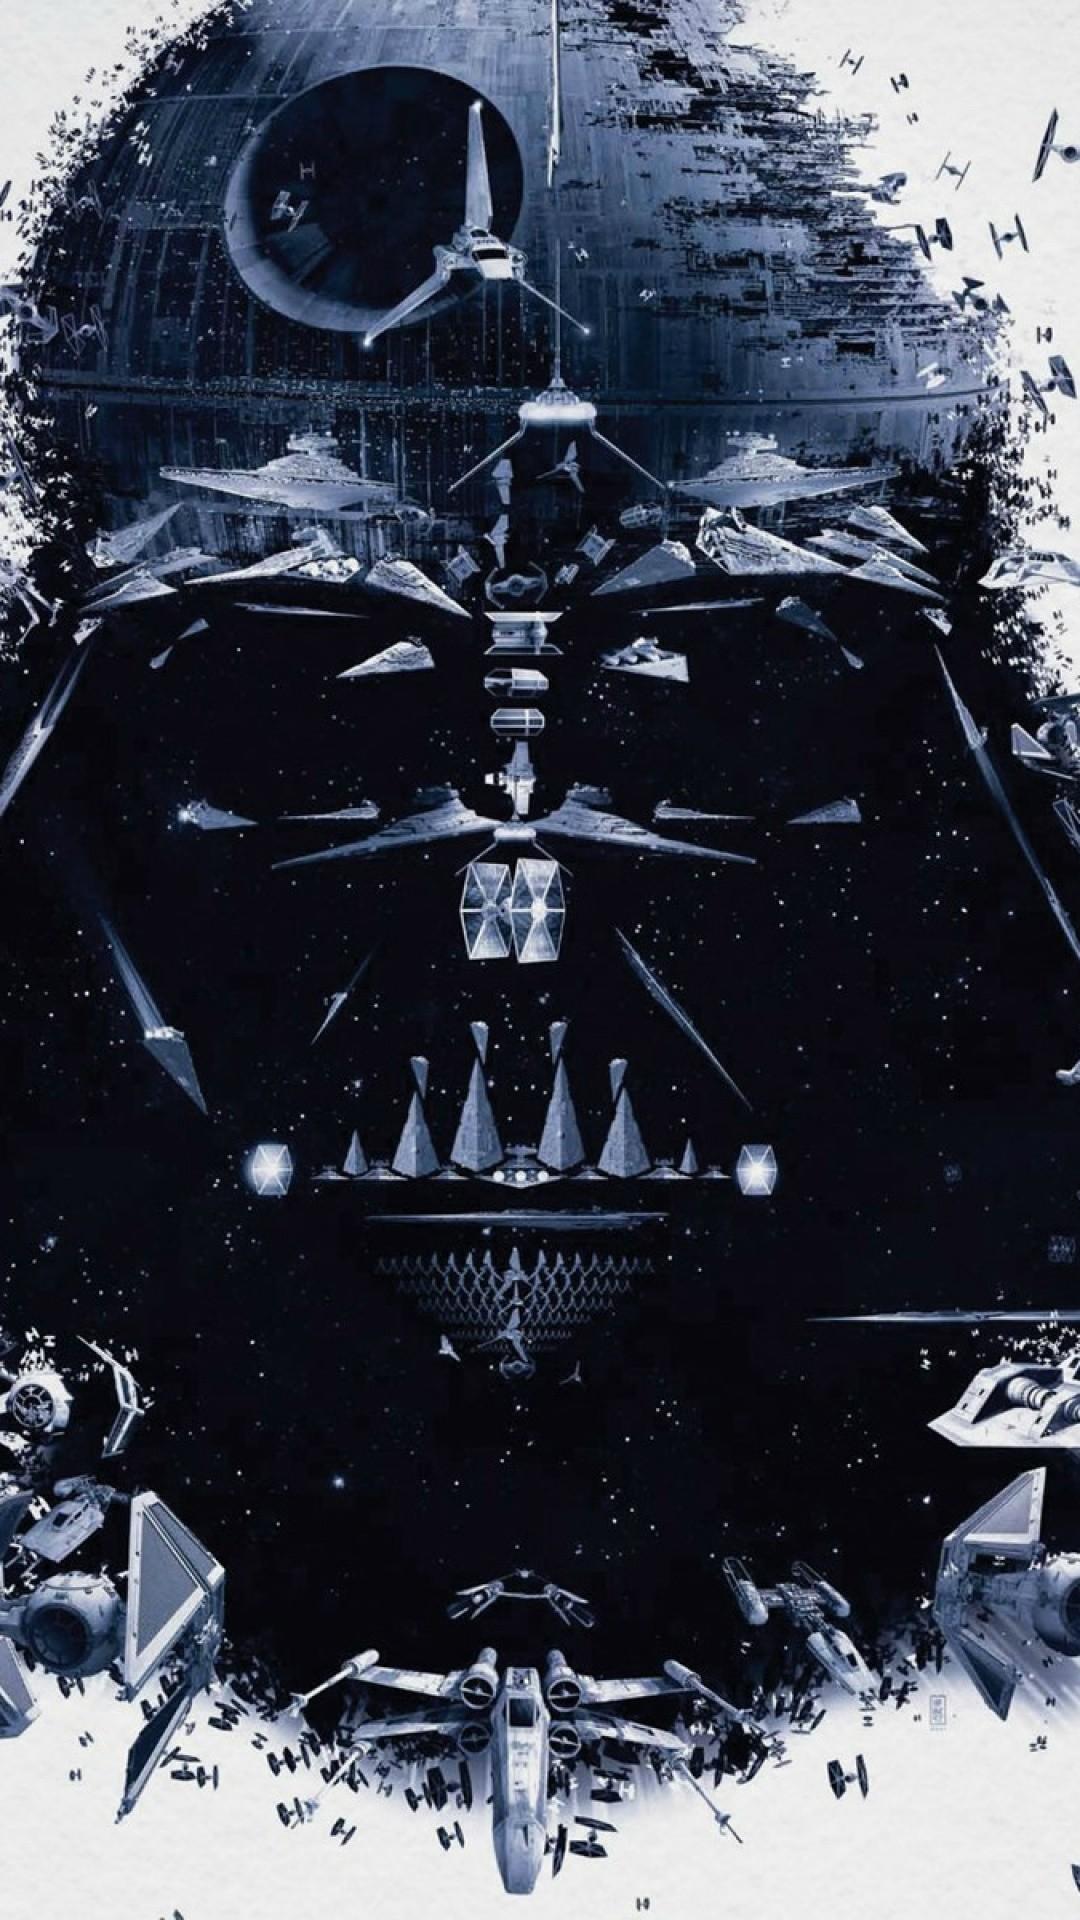 Star Wars Darth Vader Spaceships iPhone 6 Plus HD Wallpaper Download .